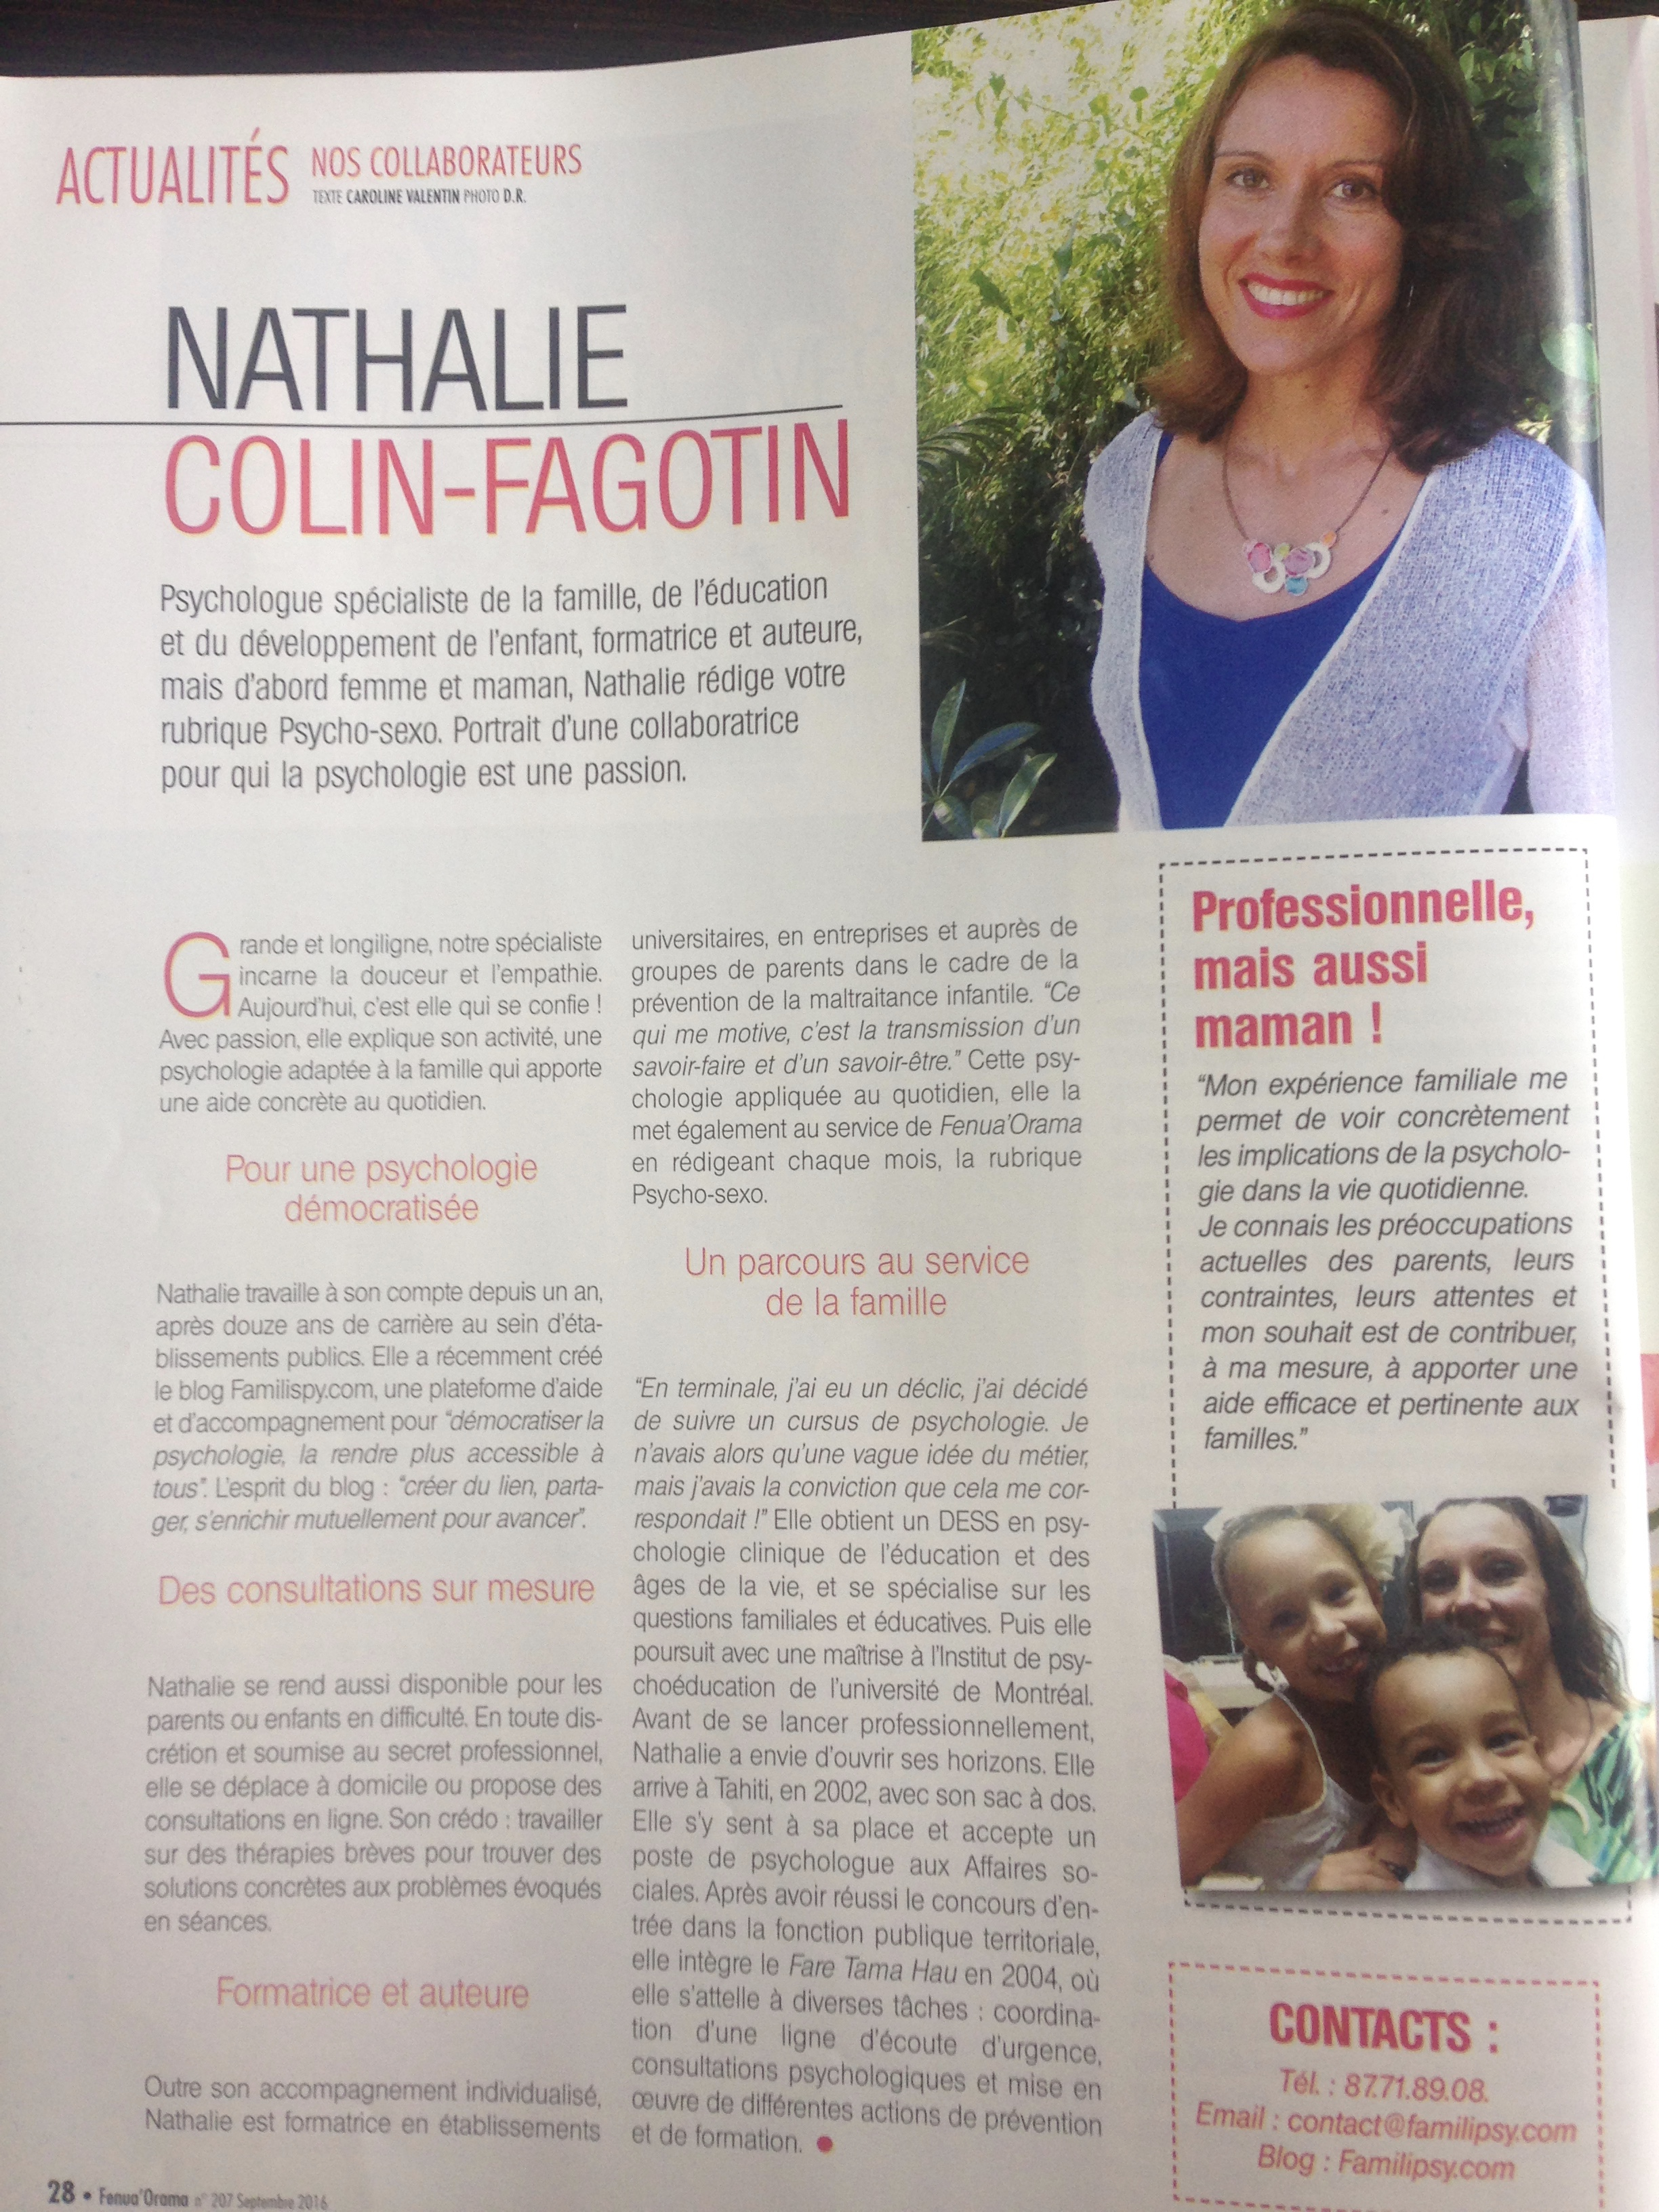 portrait Nathalie Colin Fagotin